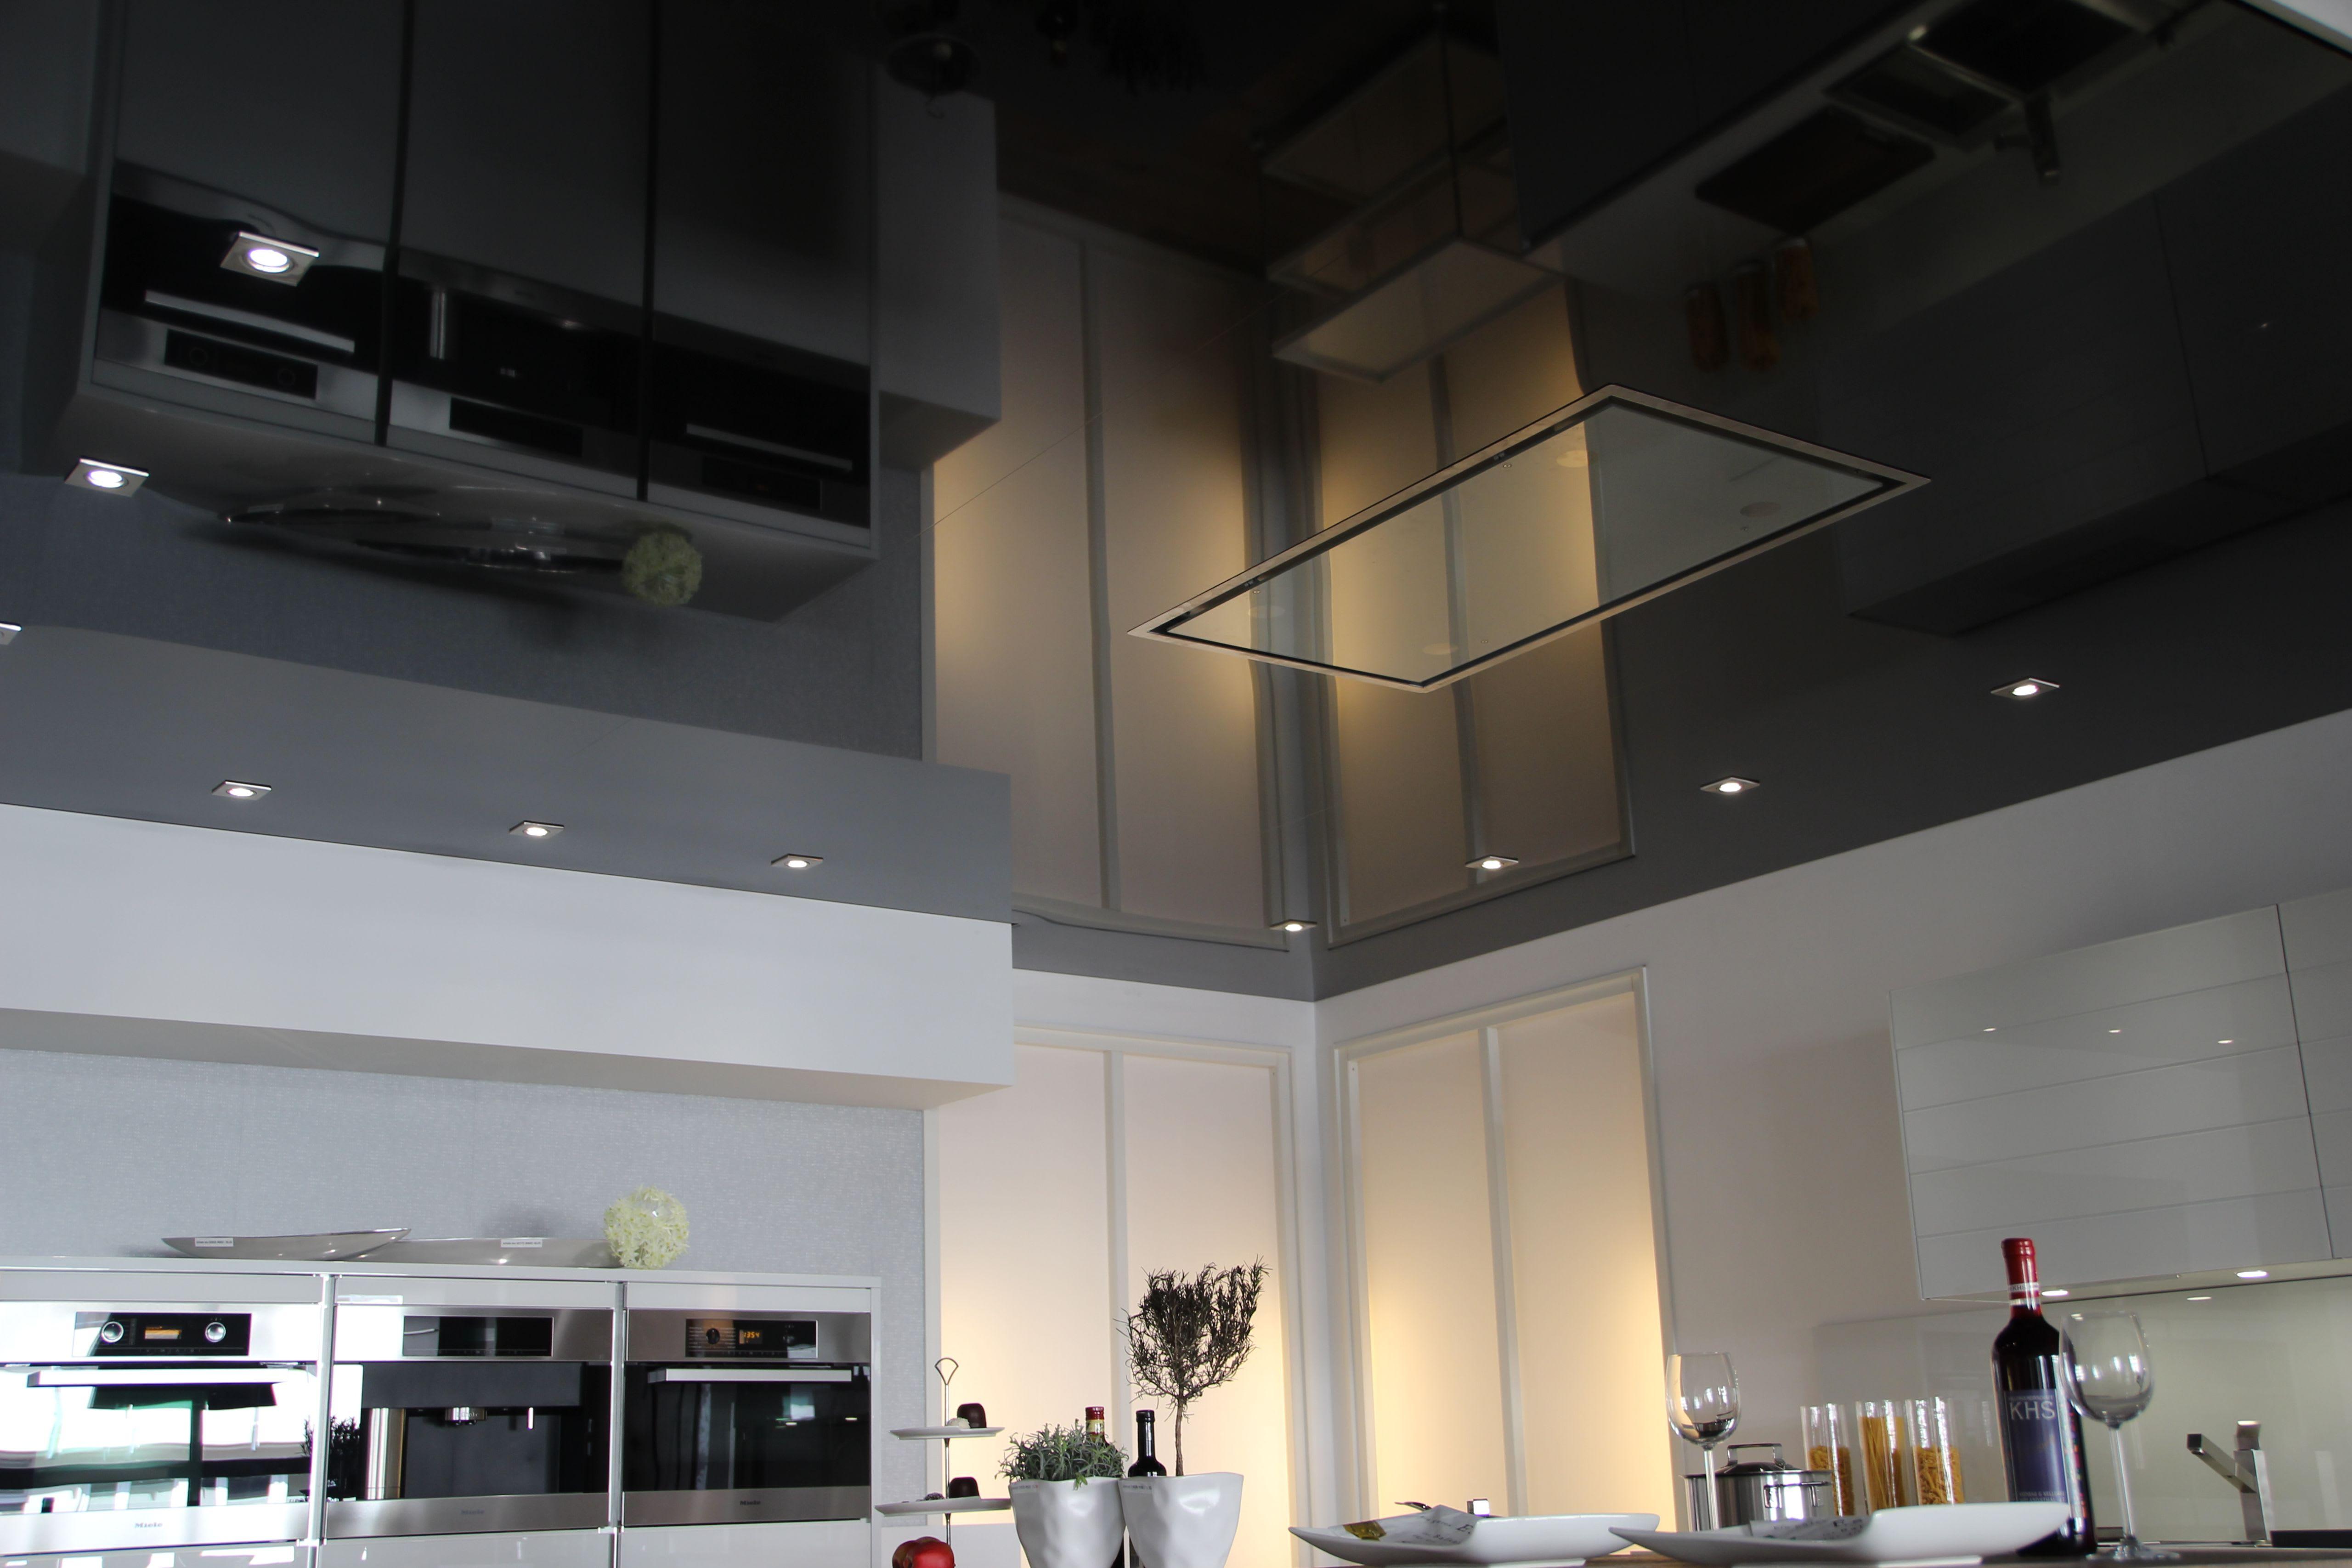 Galerie Ausstellungsräume graue hochglanz Spanndecke Beleuchtung 2